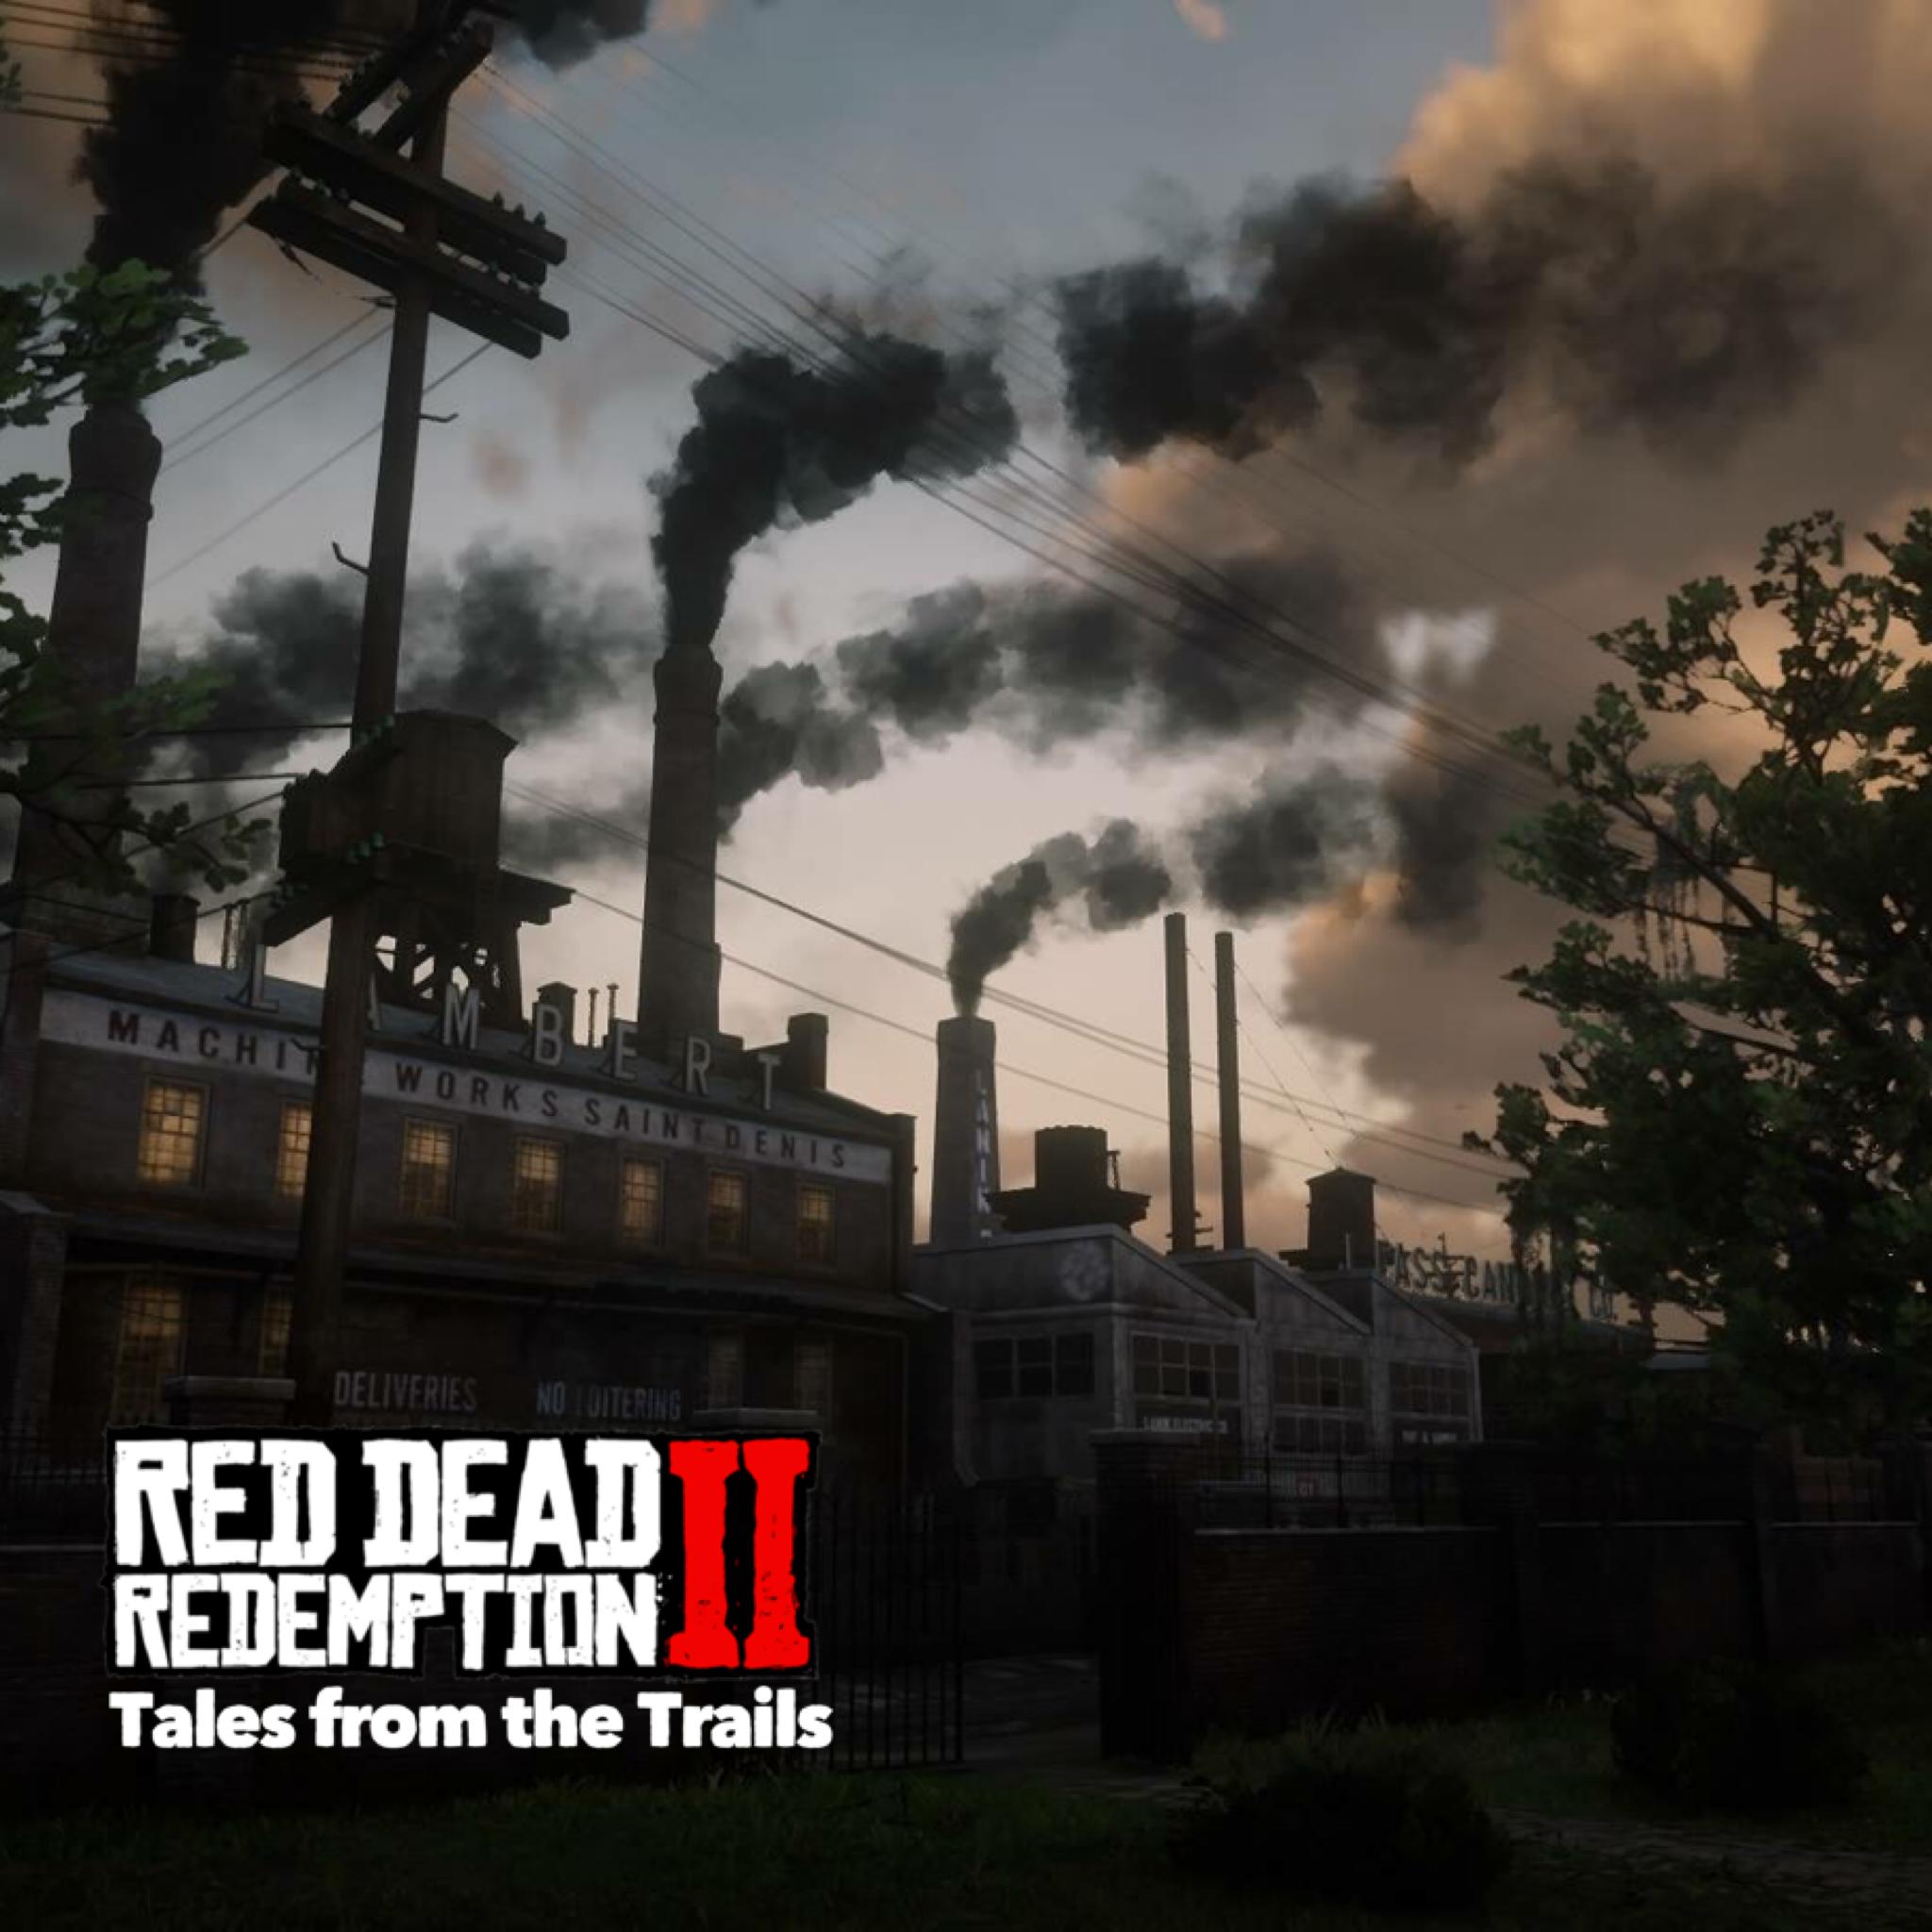 Red Dead Redemption 2 Saint Denis Factories At Night Red Dead Redemption Red Dead Redemption Ii Saint Denis